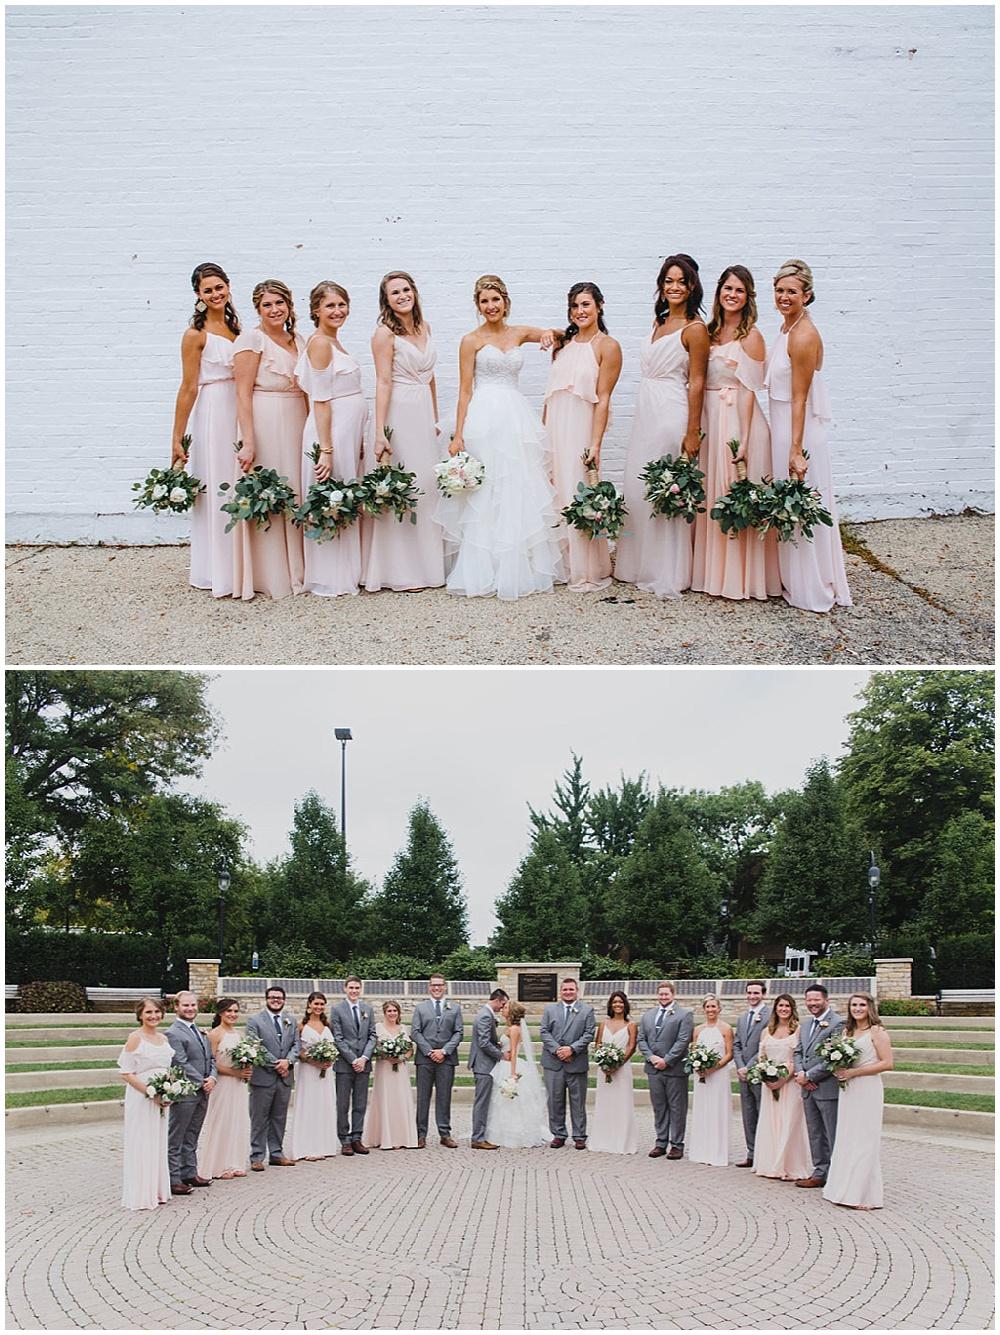 blush and gray bridal party   Chicago urban rustic wedding  Sandra Armenteros Photography   Jessica Dum Wedding Coordination